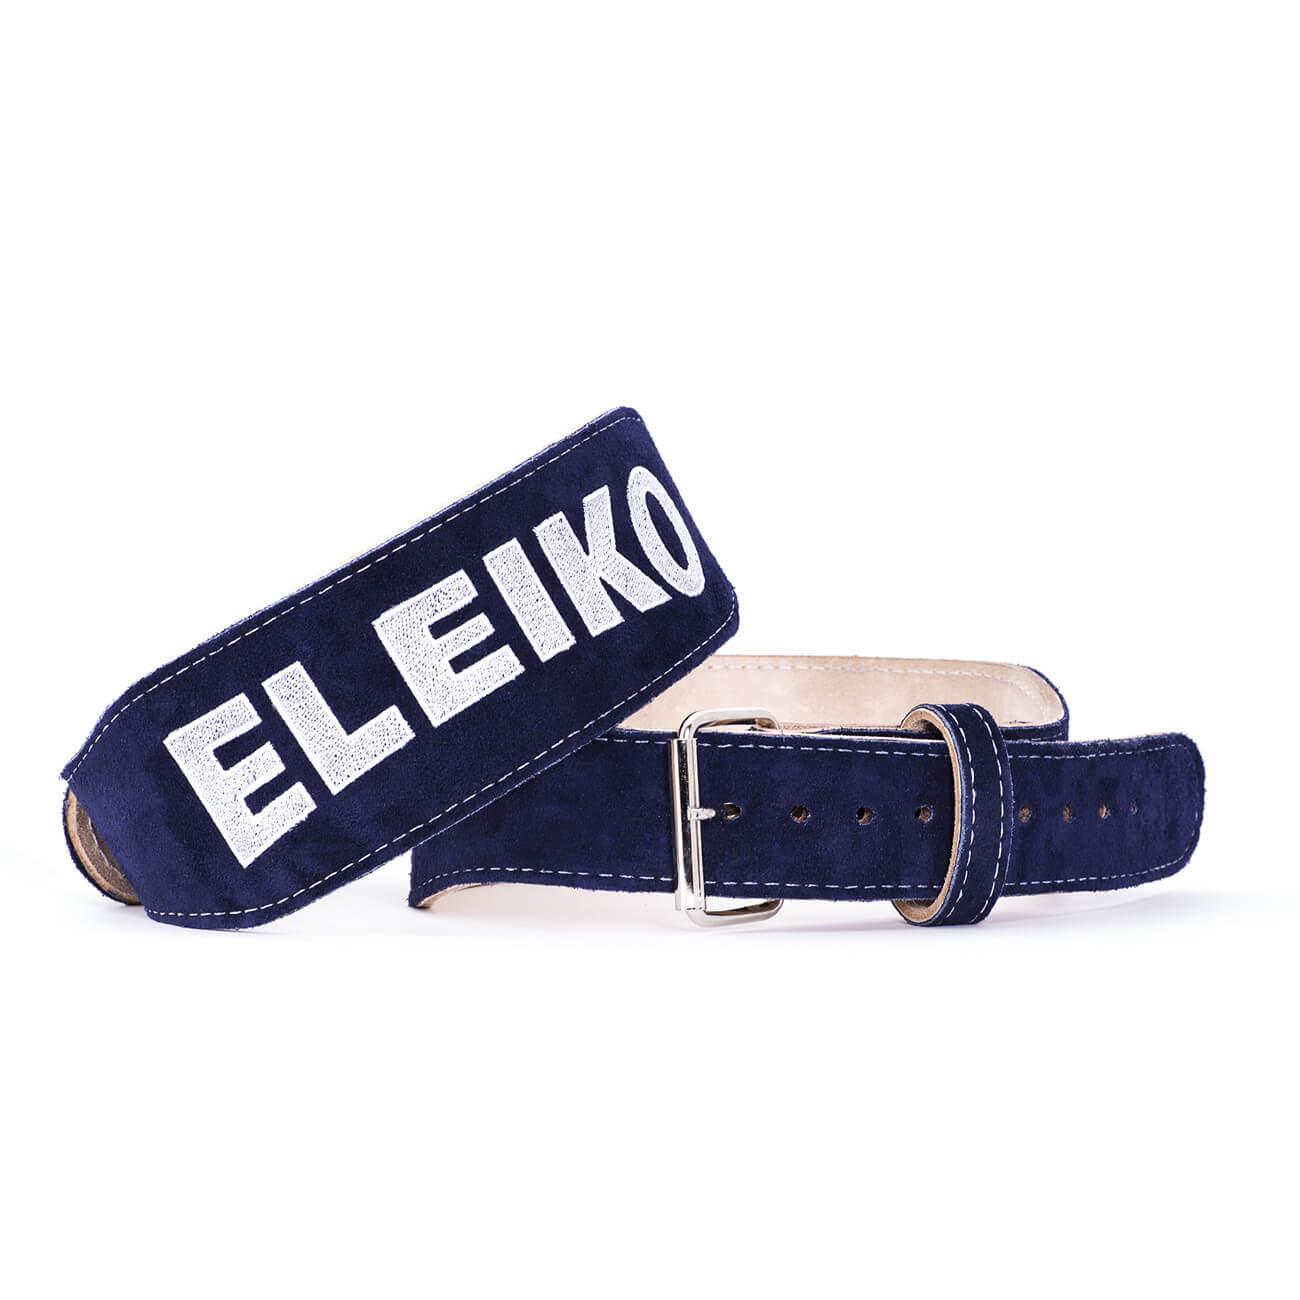 blue eleiko weightlifting belt